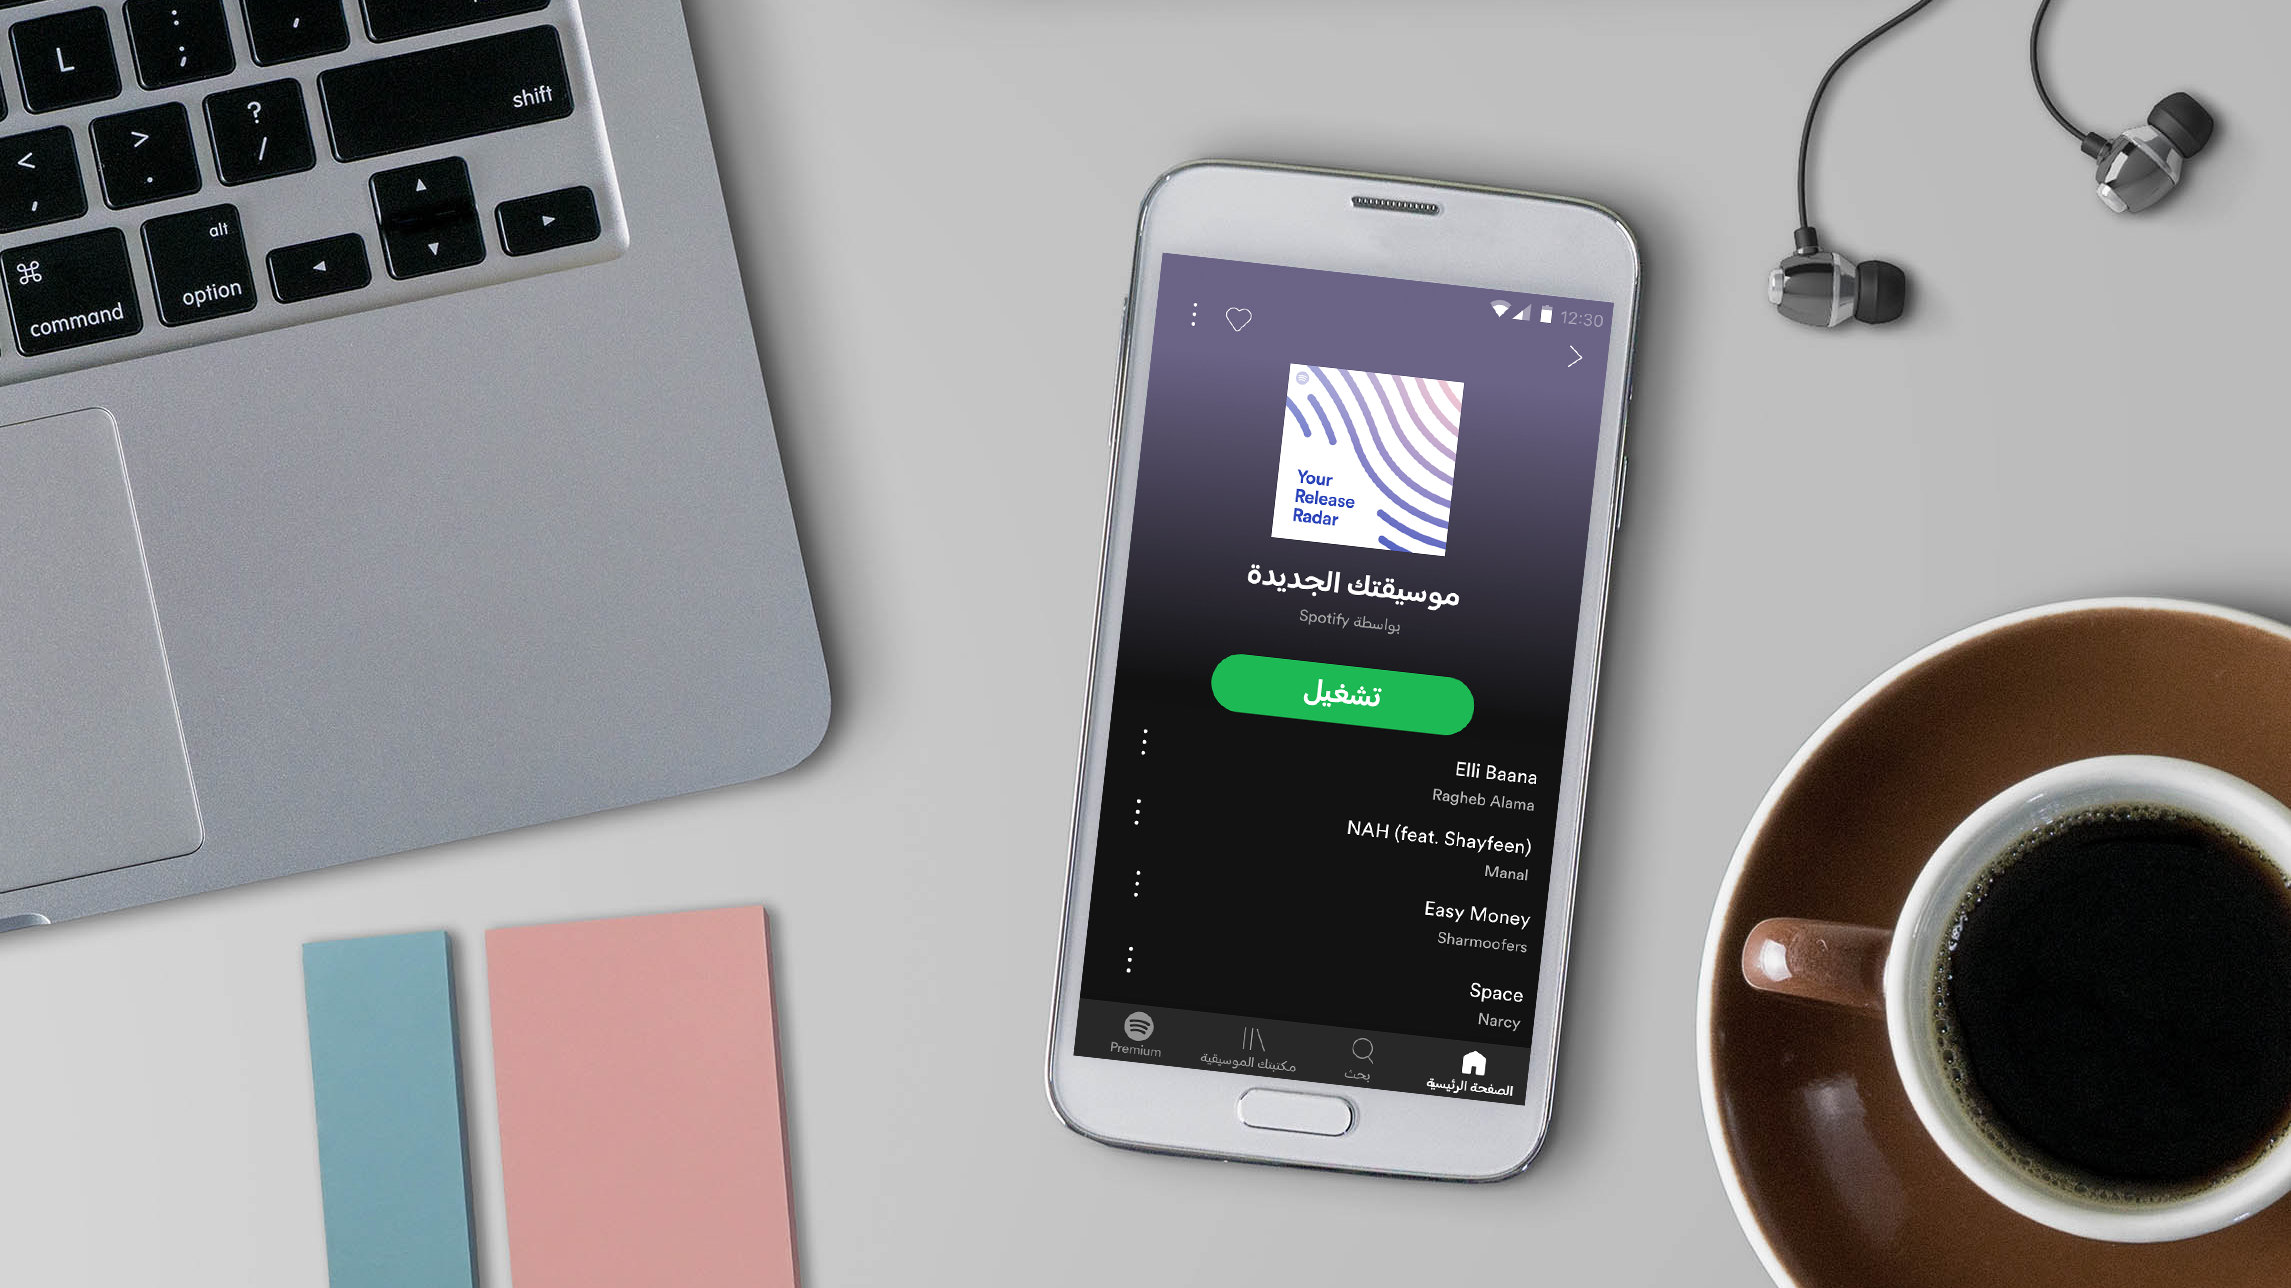 Spotify smartphone app